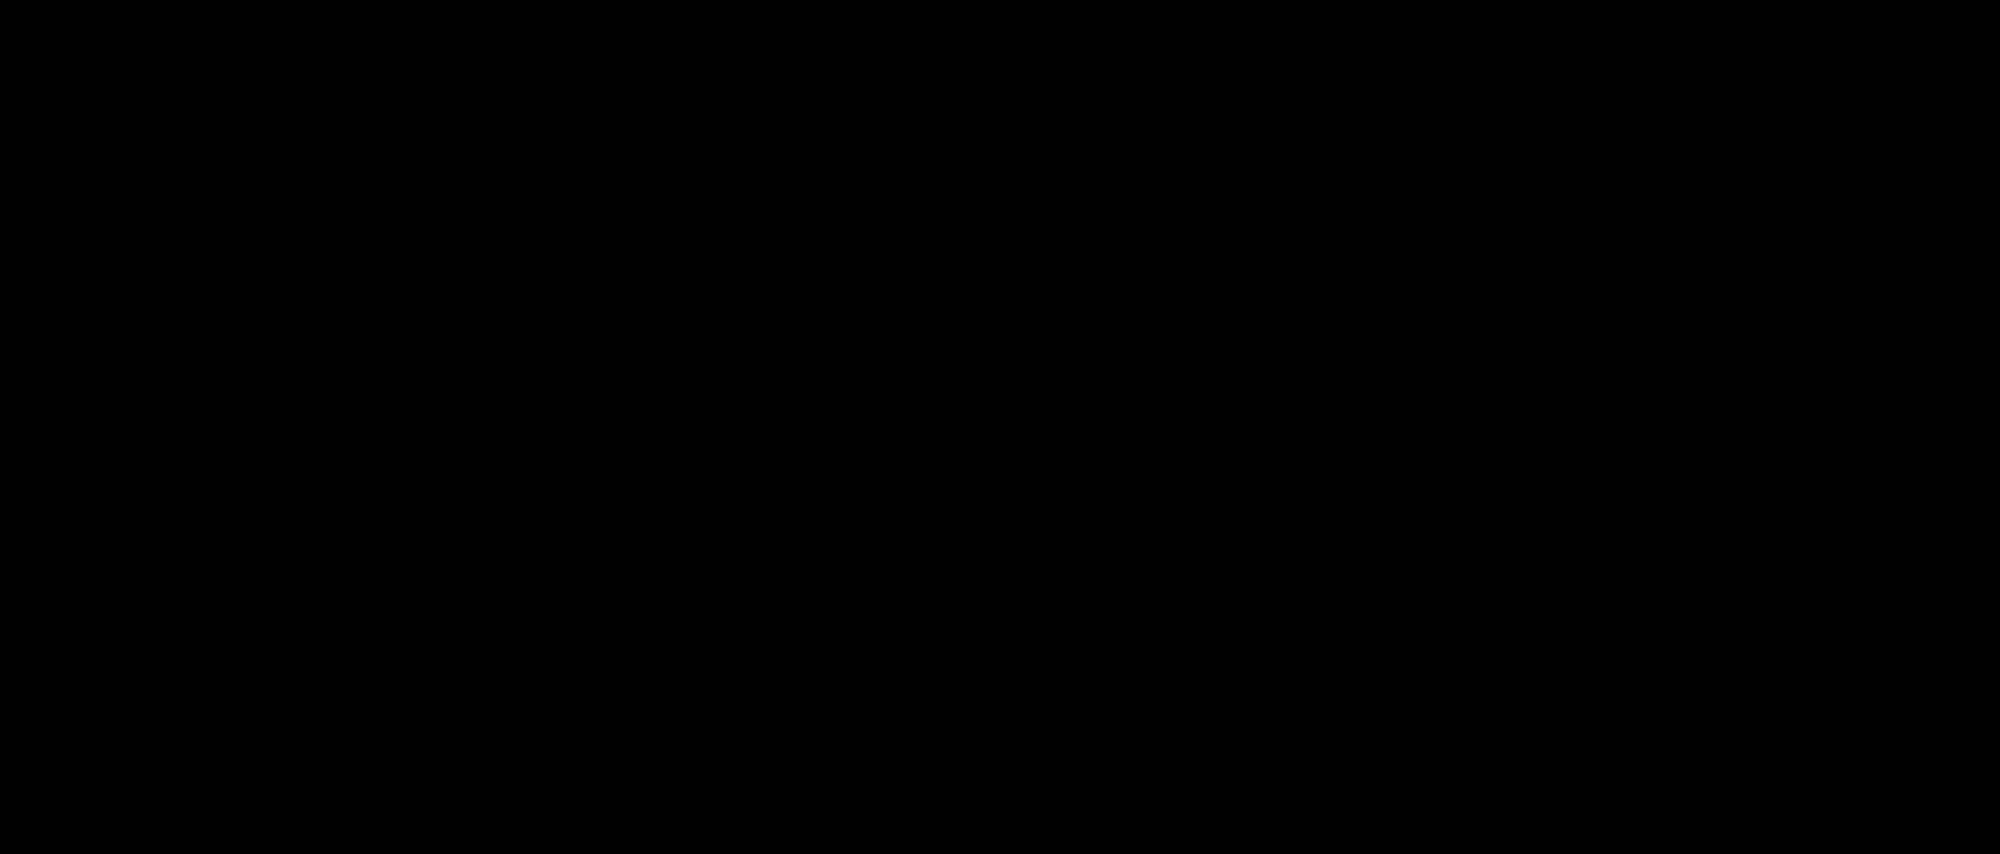 AMER CAN-logo-black.png